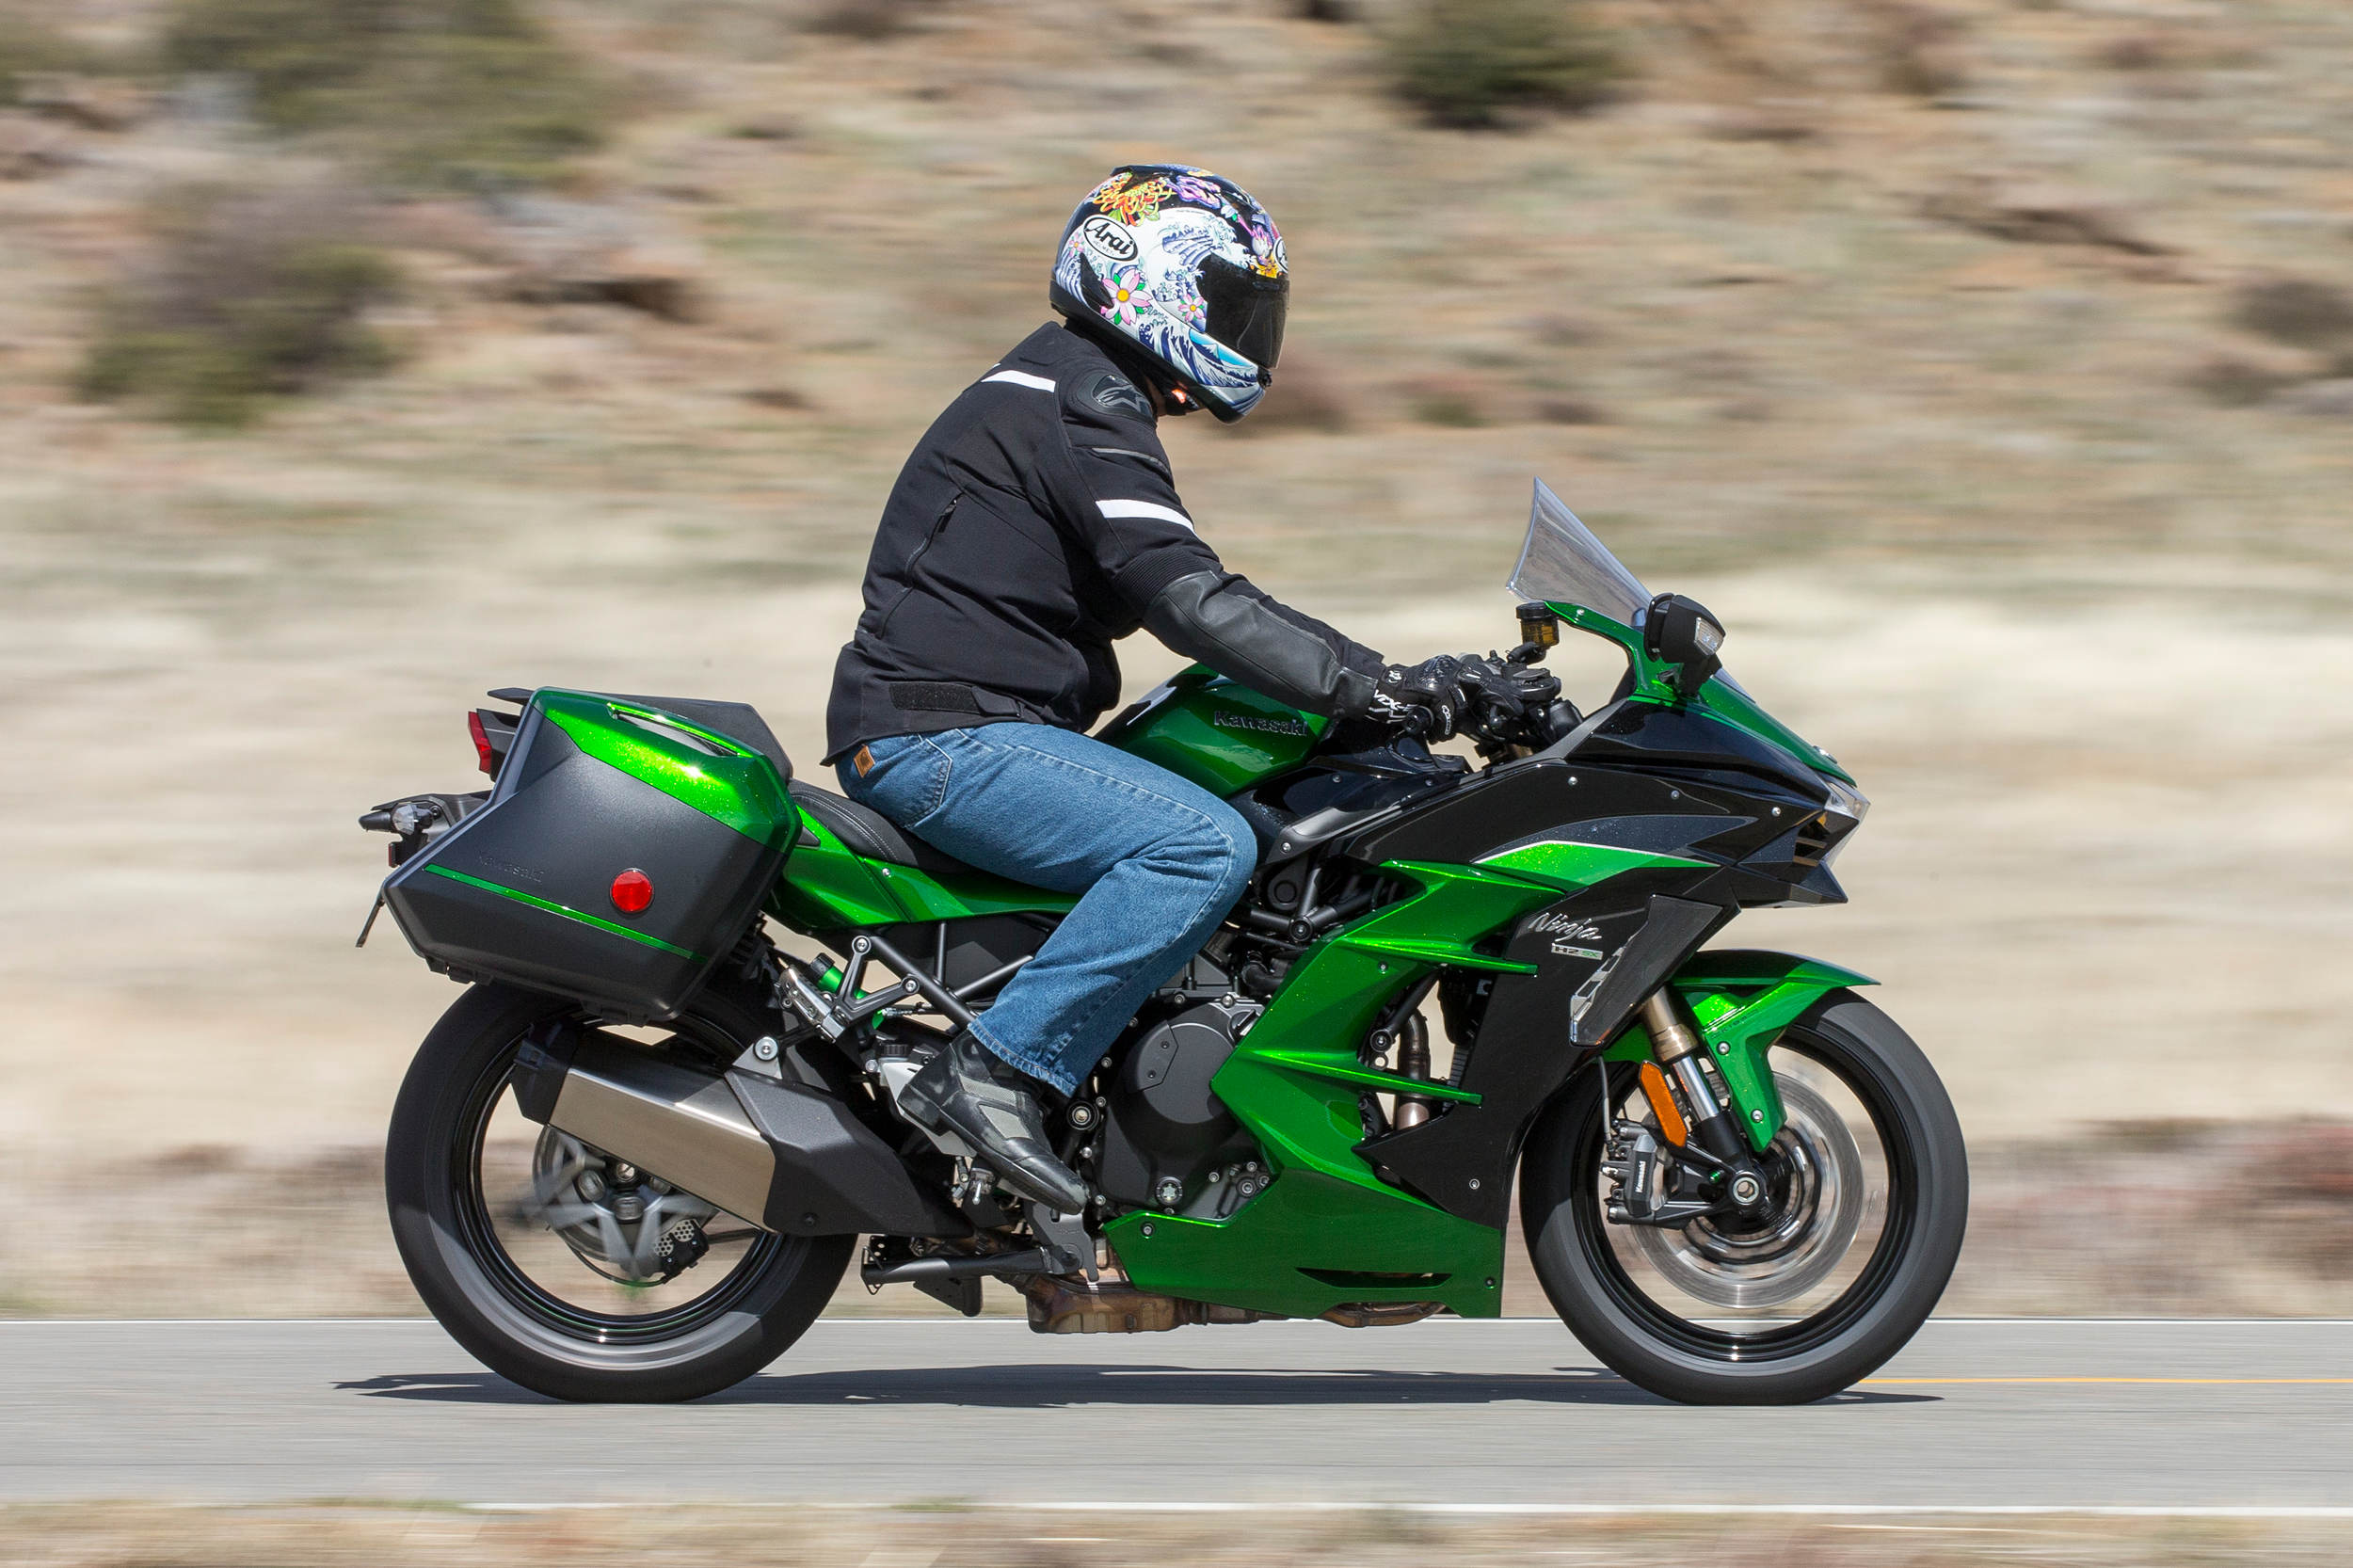 2018 Kawasaki Ninja H2 Sx Se Md First Ride Motorcycledailycom